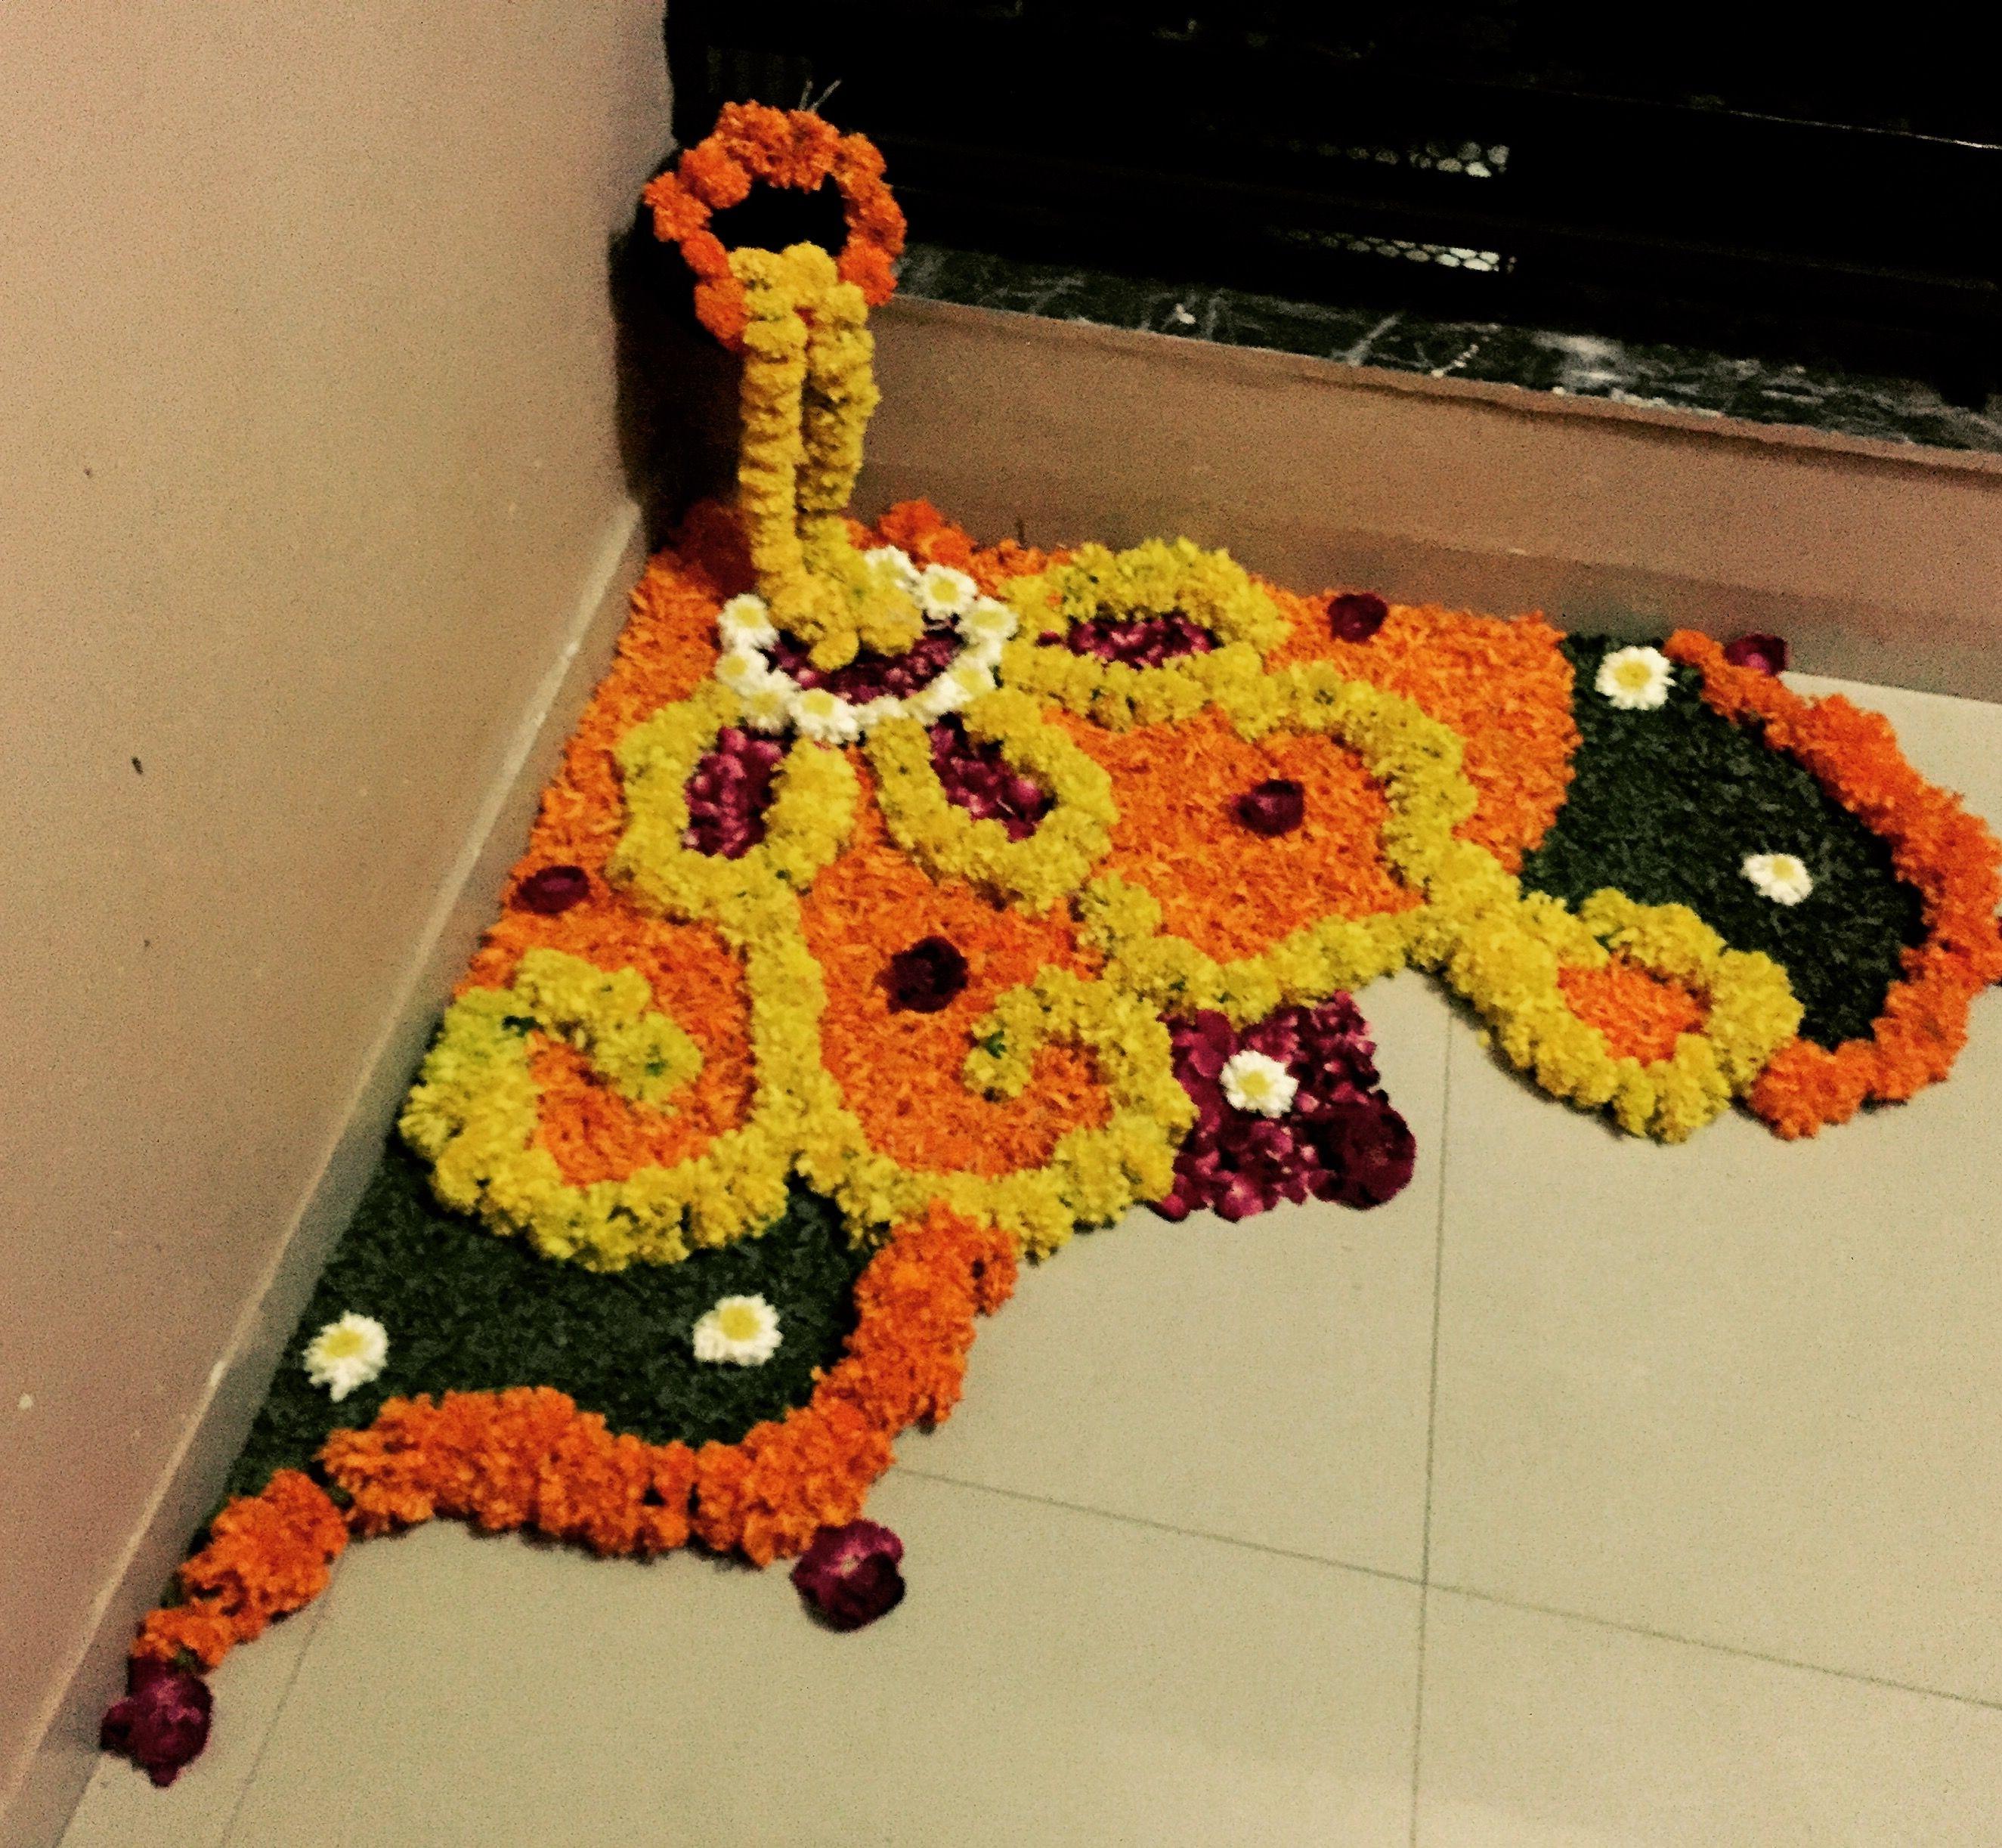 Diy House Housewarming Flower Rangoli Floor Decoration Using Flower Petals Leaves Rangoli Designs Flower Diwali Decorations Diy Diwali Decorations